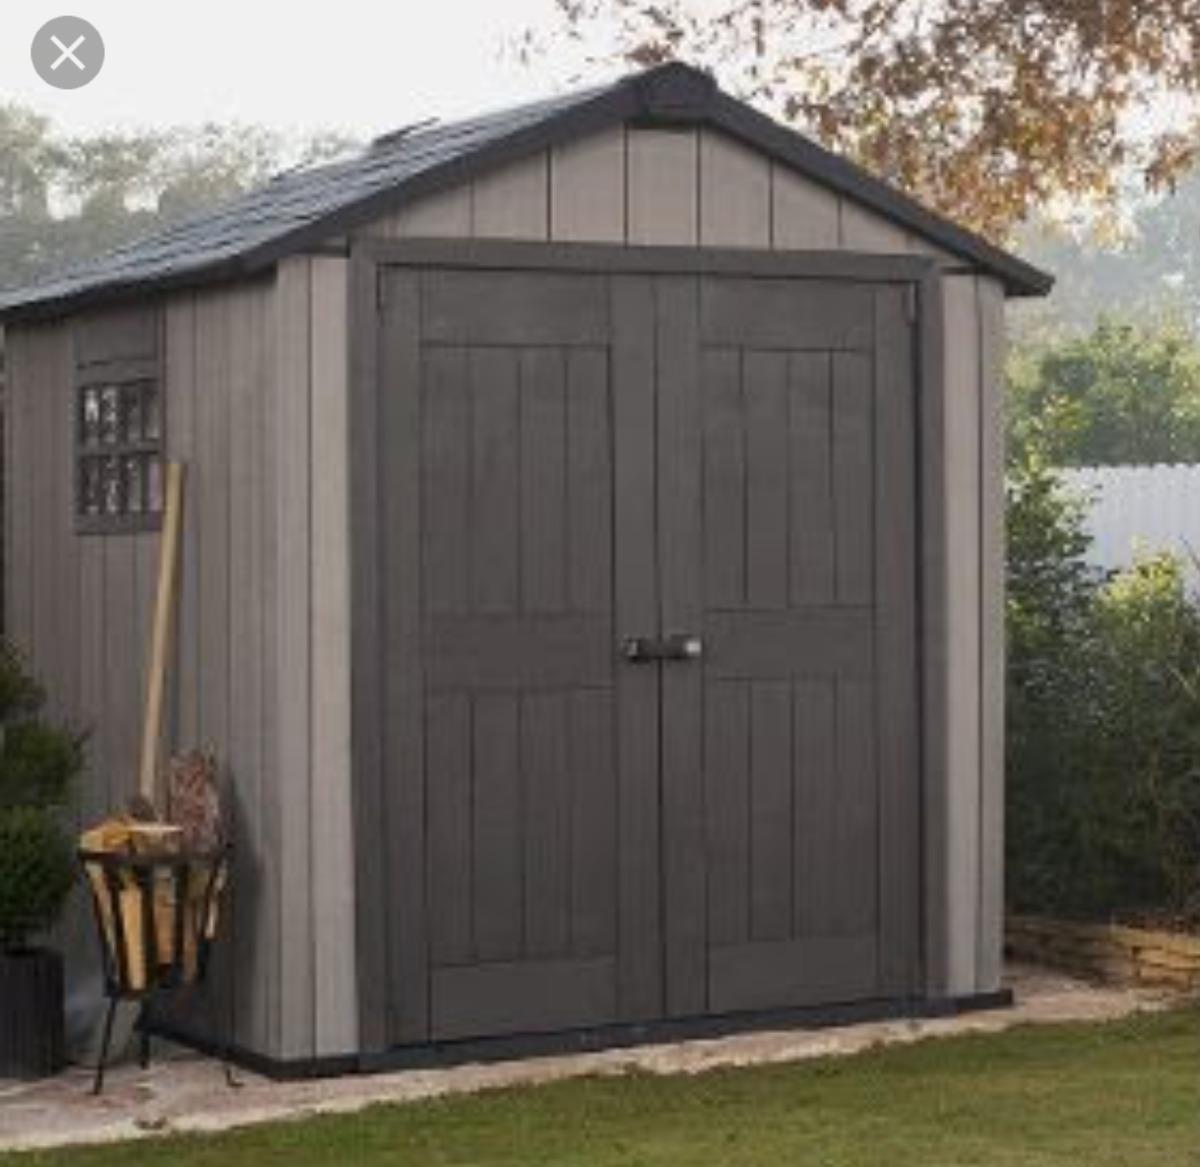 Cobertizo casa para guardar herramientas caseta 19 425 for Caseta para guardar bicis